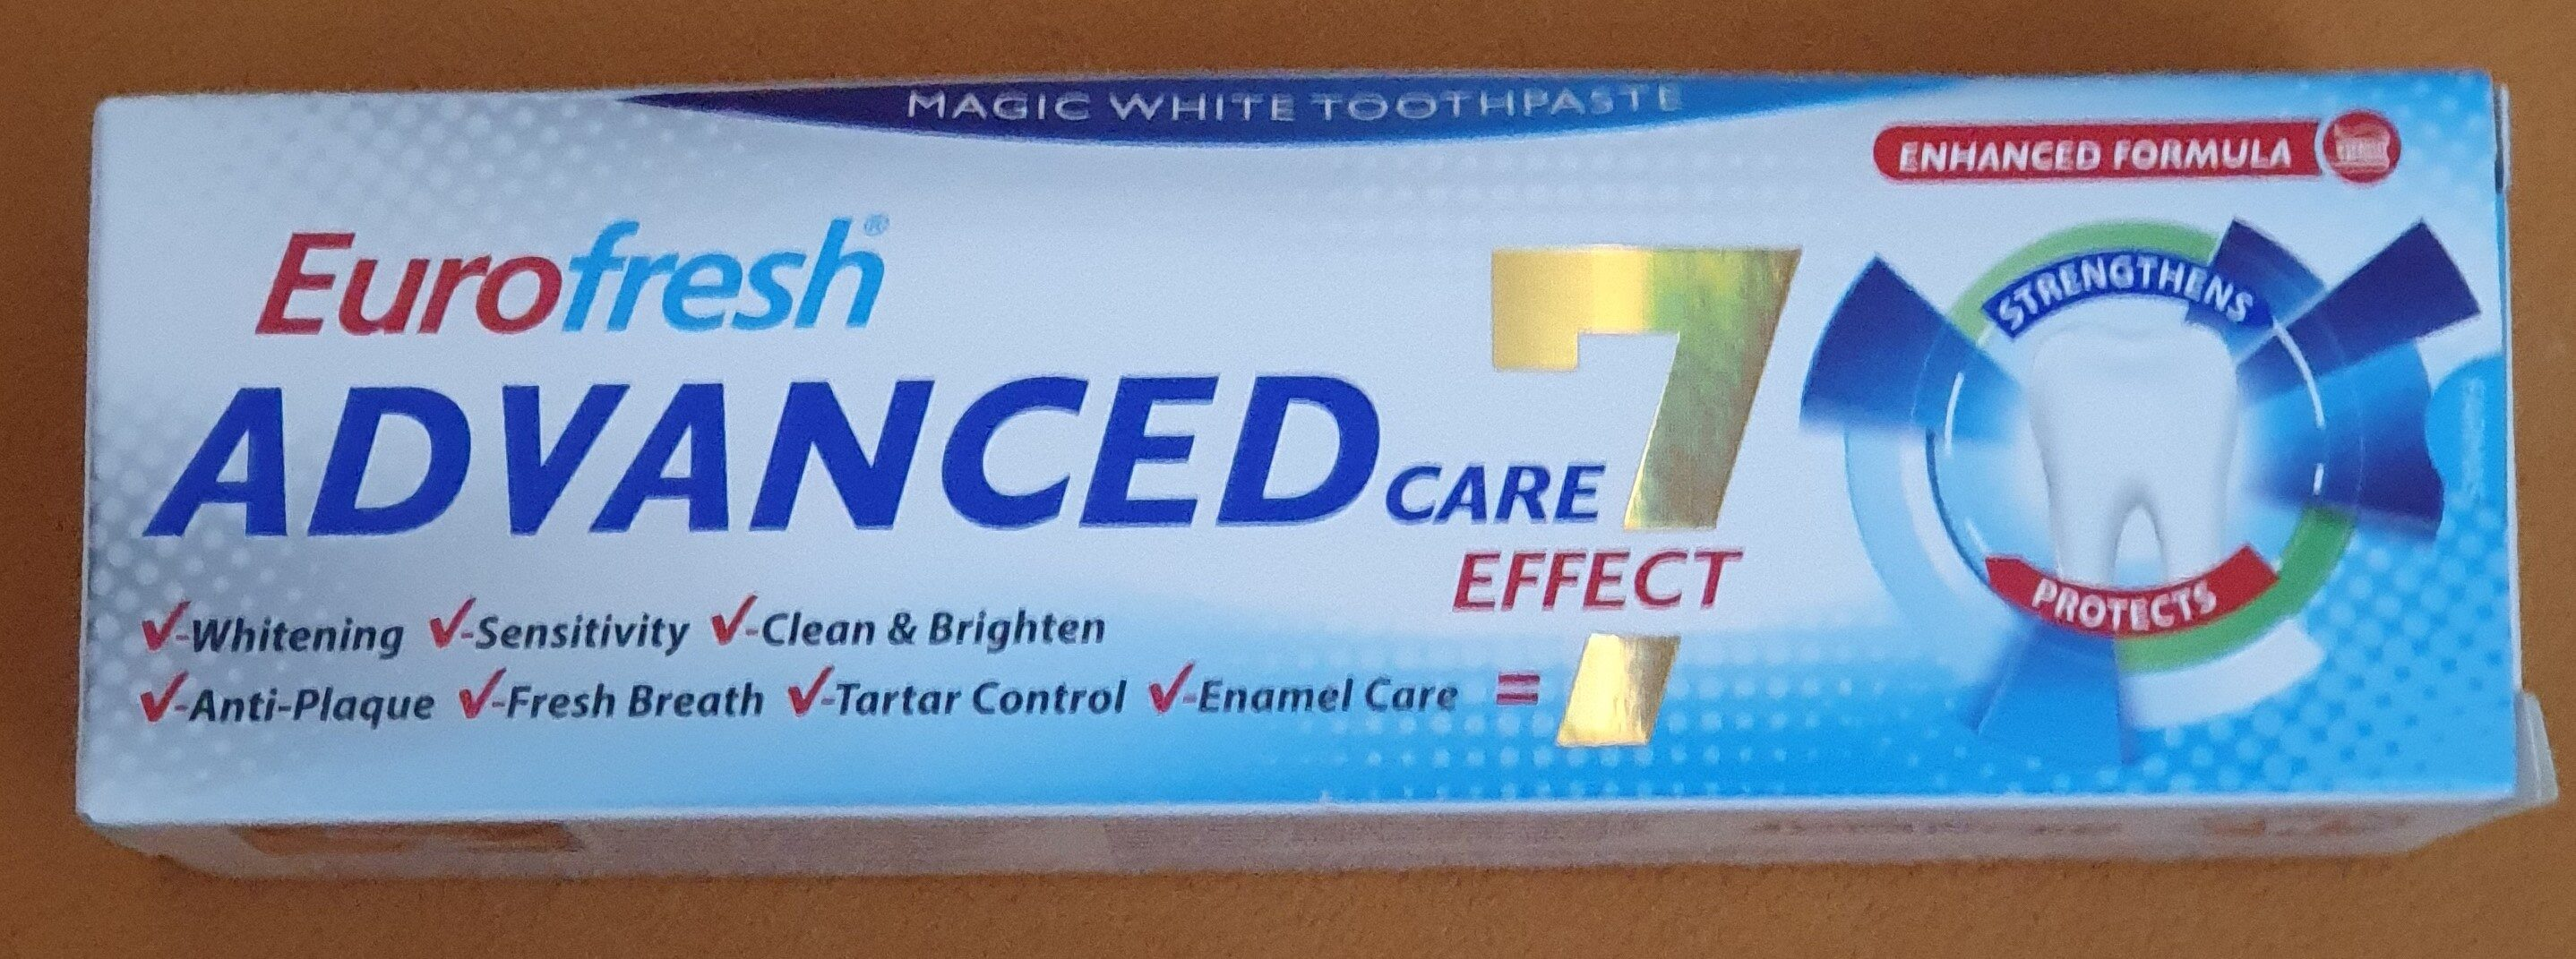 Eurofresh Advanced Care 7 Effect - Product - en